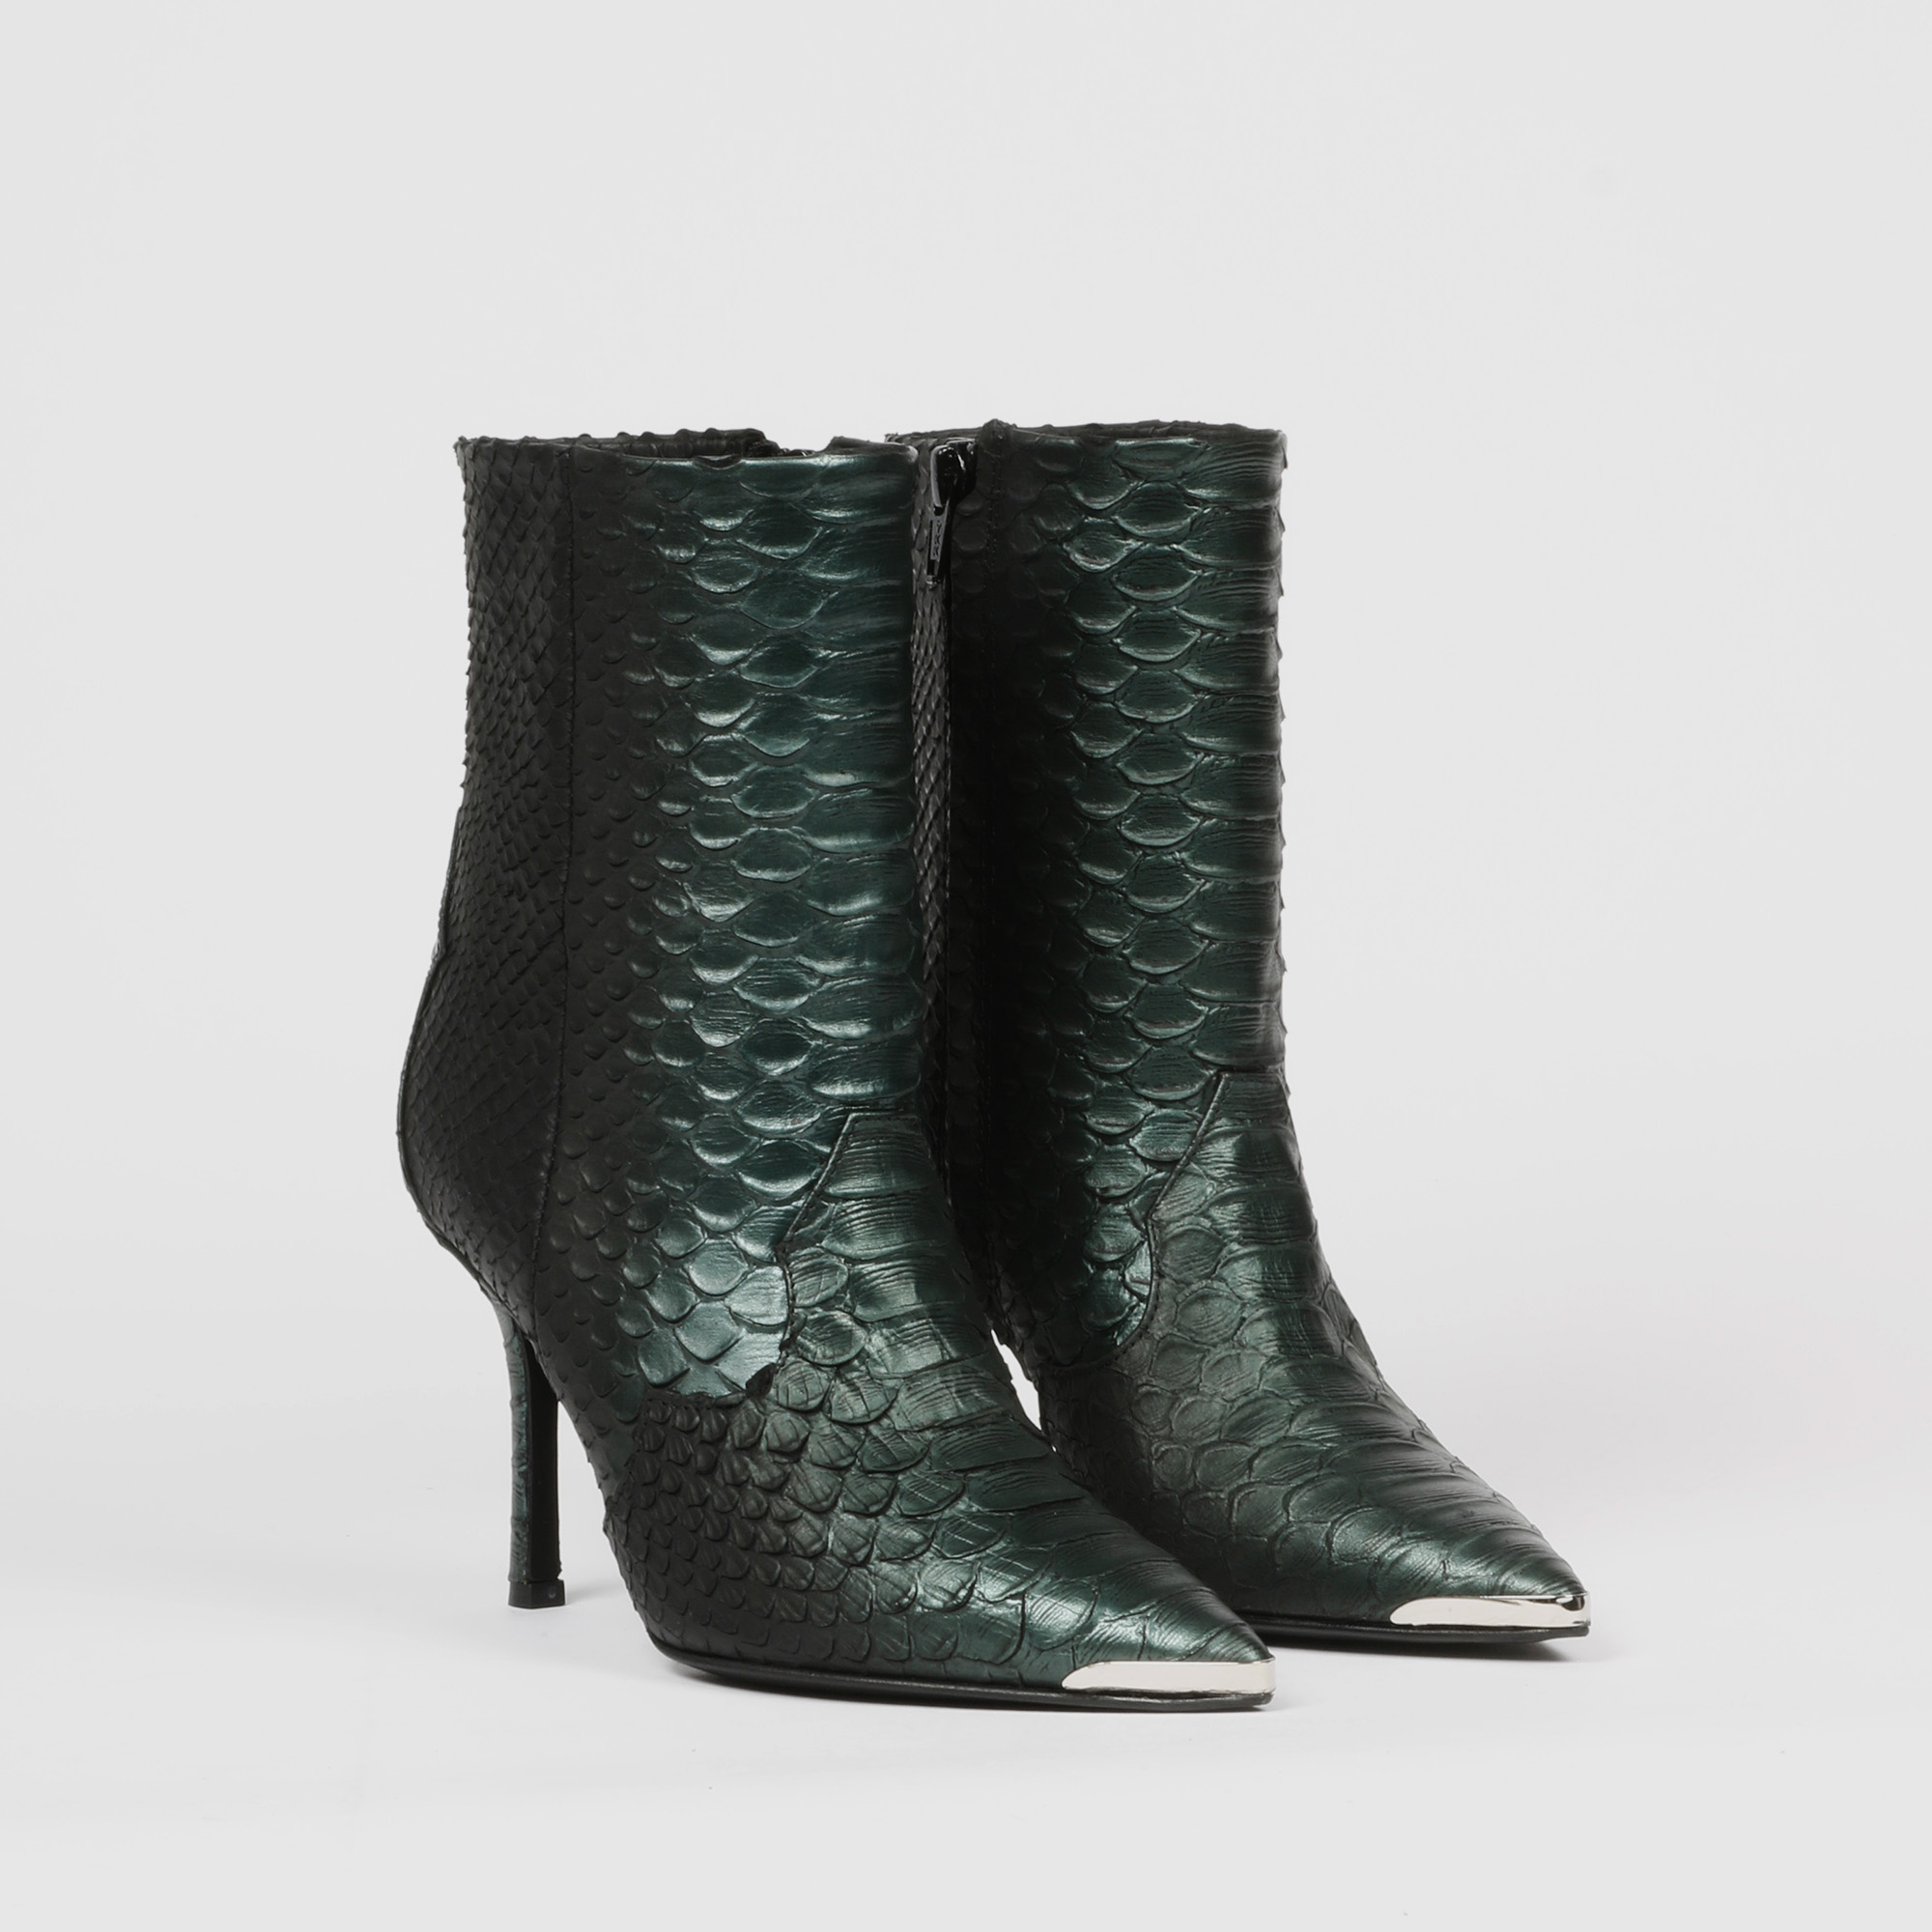 Stivali anaconda metal - Verde